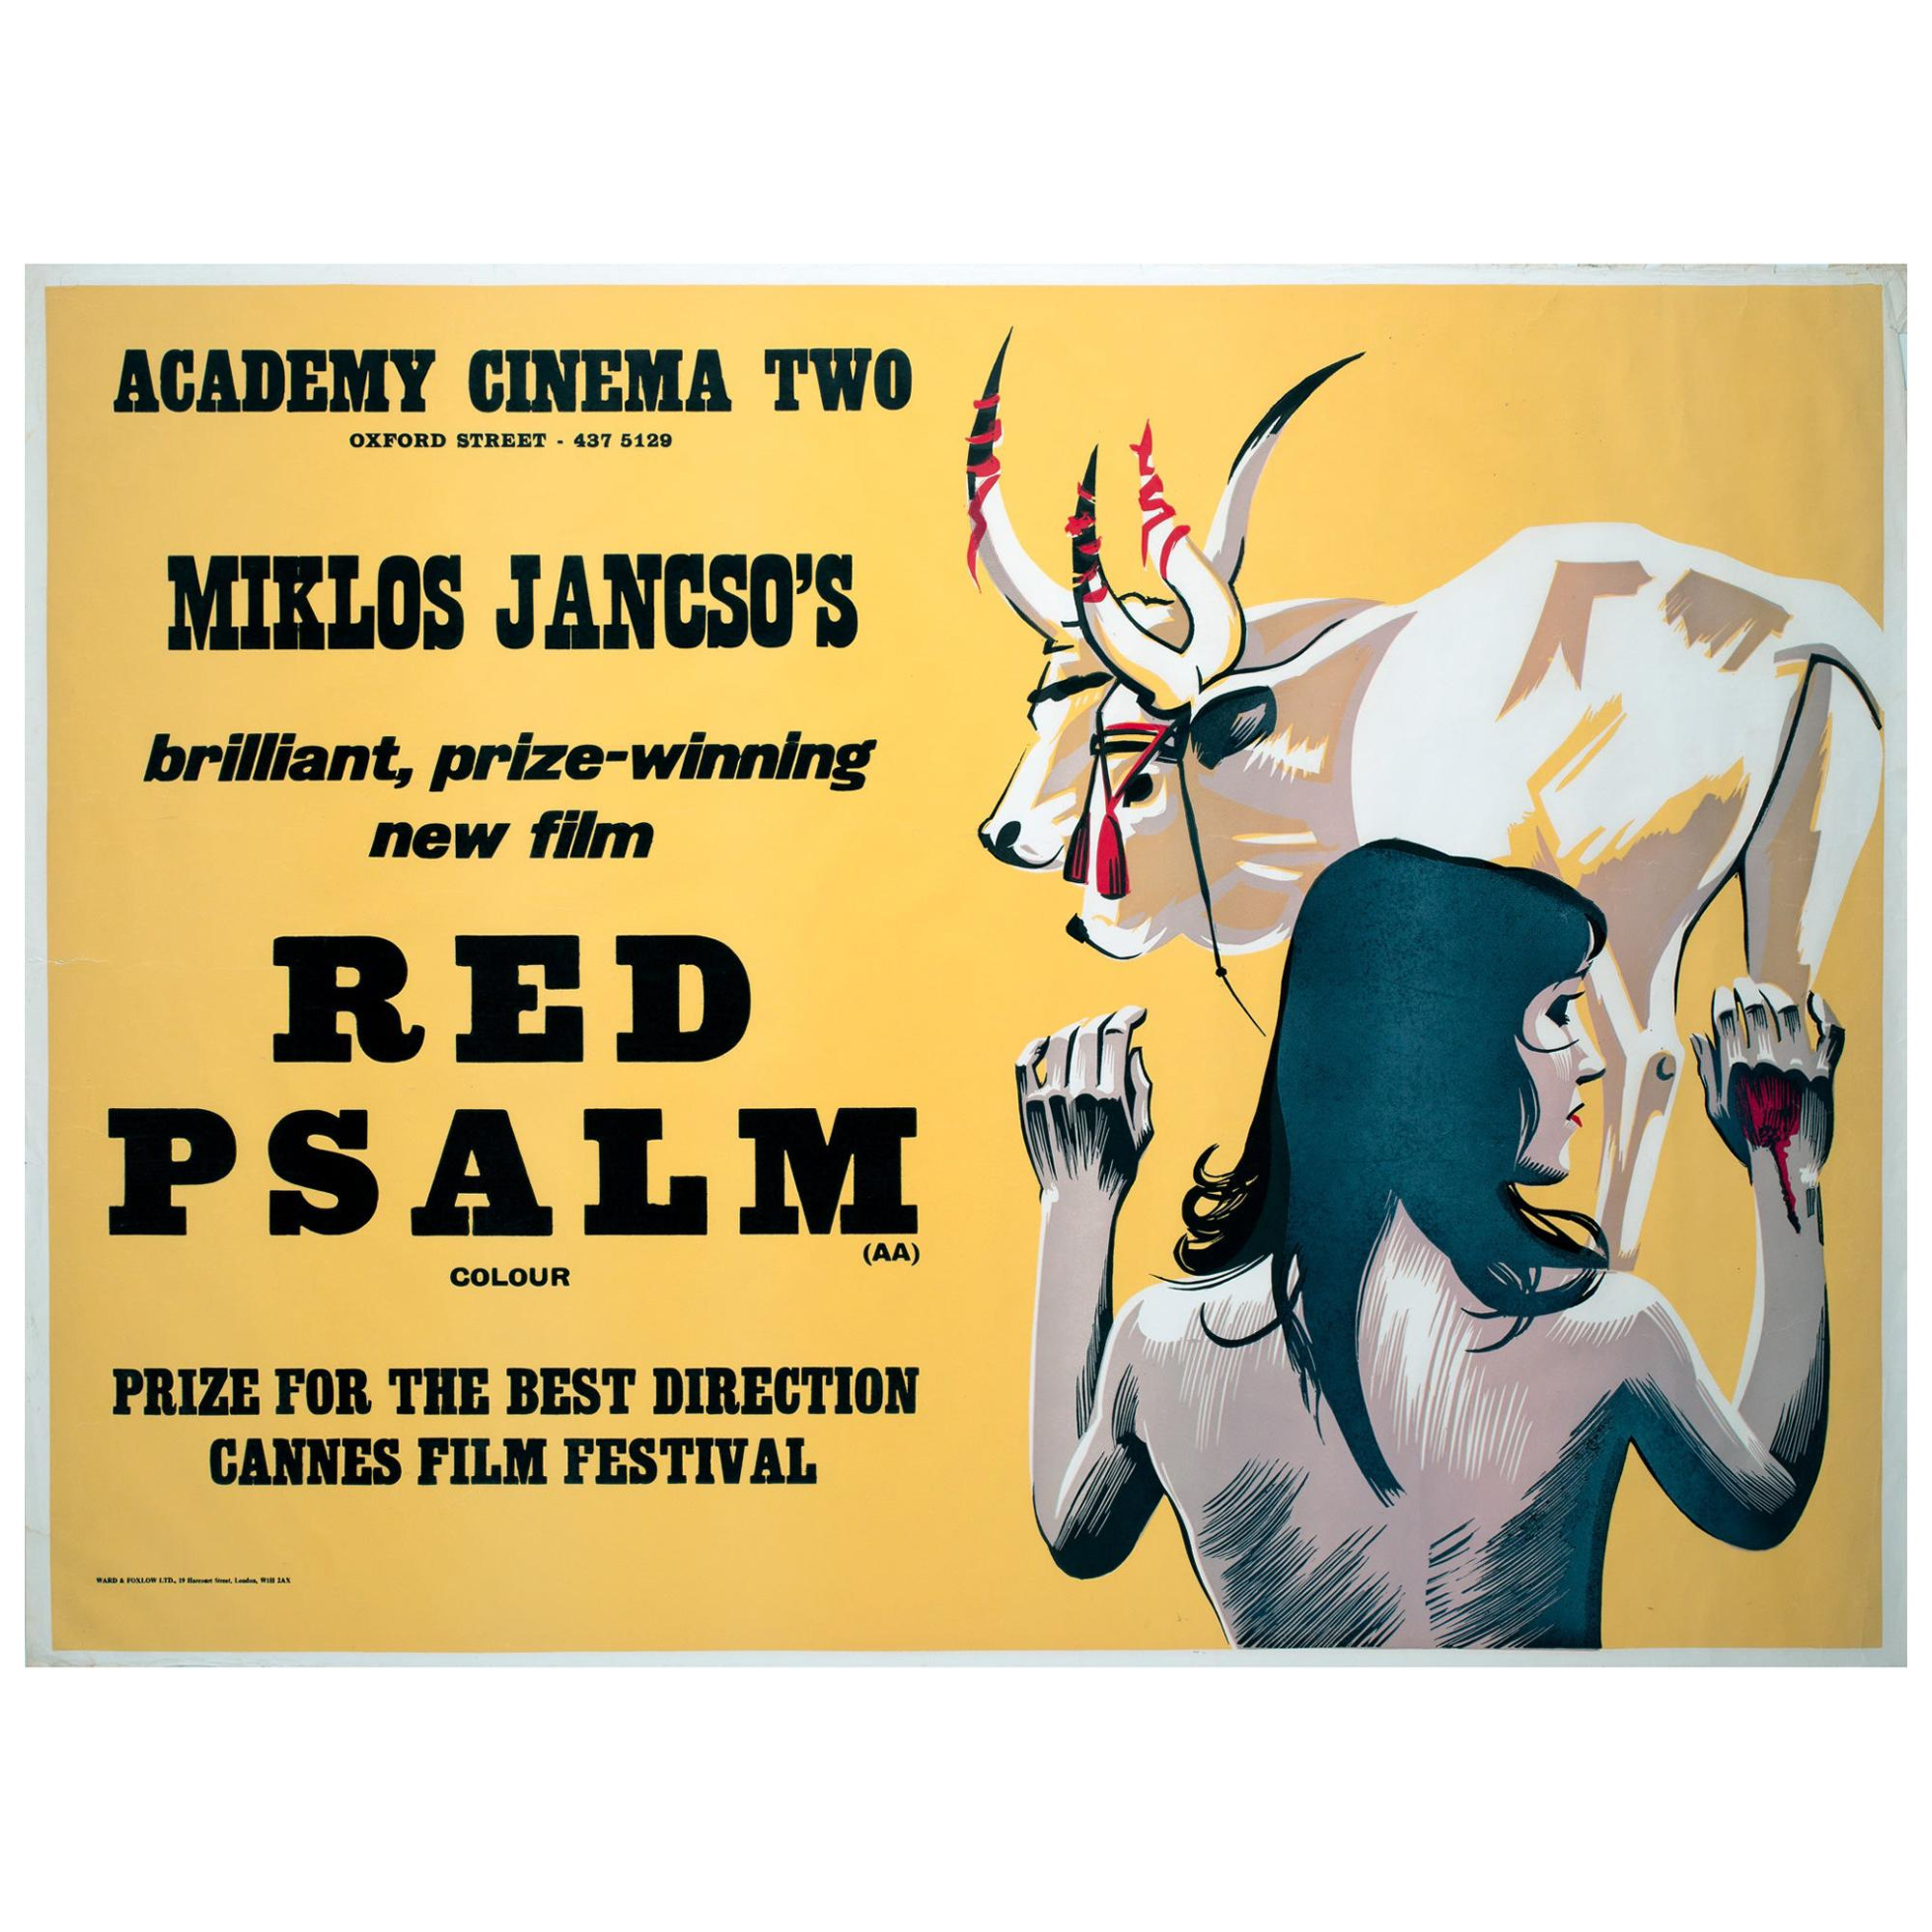 Red Psalm 1973 Academy Cinema London UK Quad Film Poster, Strausfeld